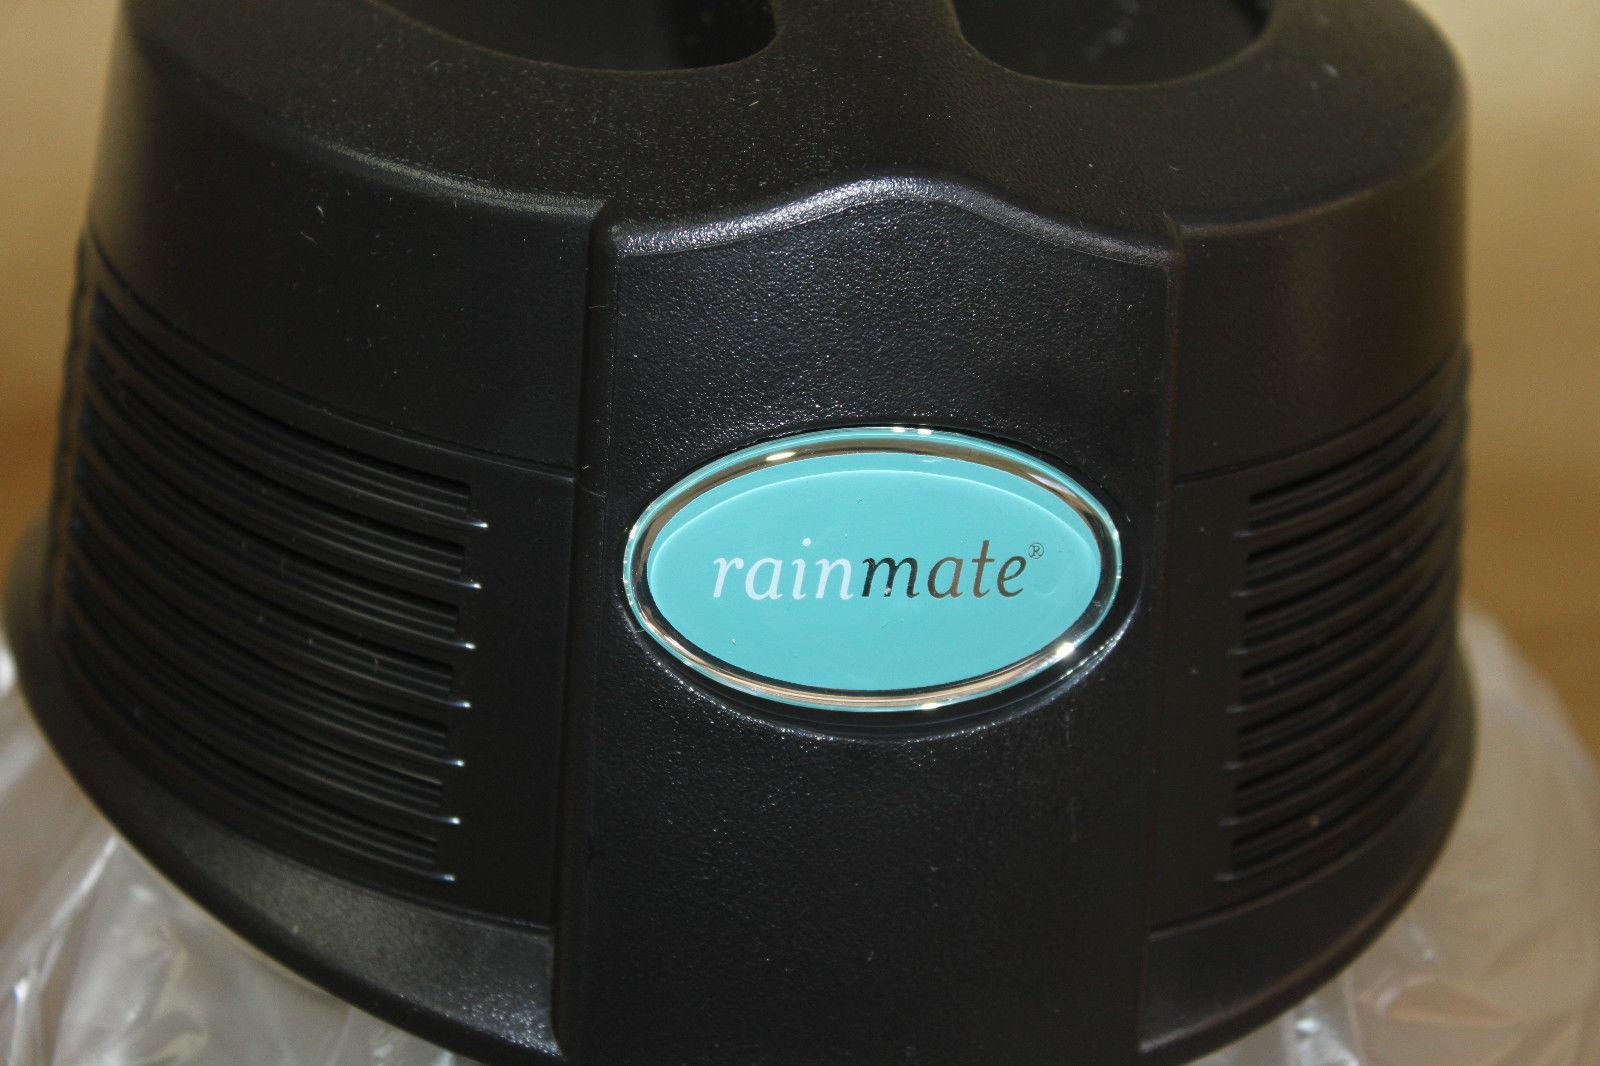 2015 Rainbow Rainmate Air Purifier Humidifier Black E2 Vacuum Fragrance Scent Essential Oils